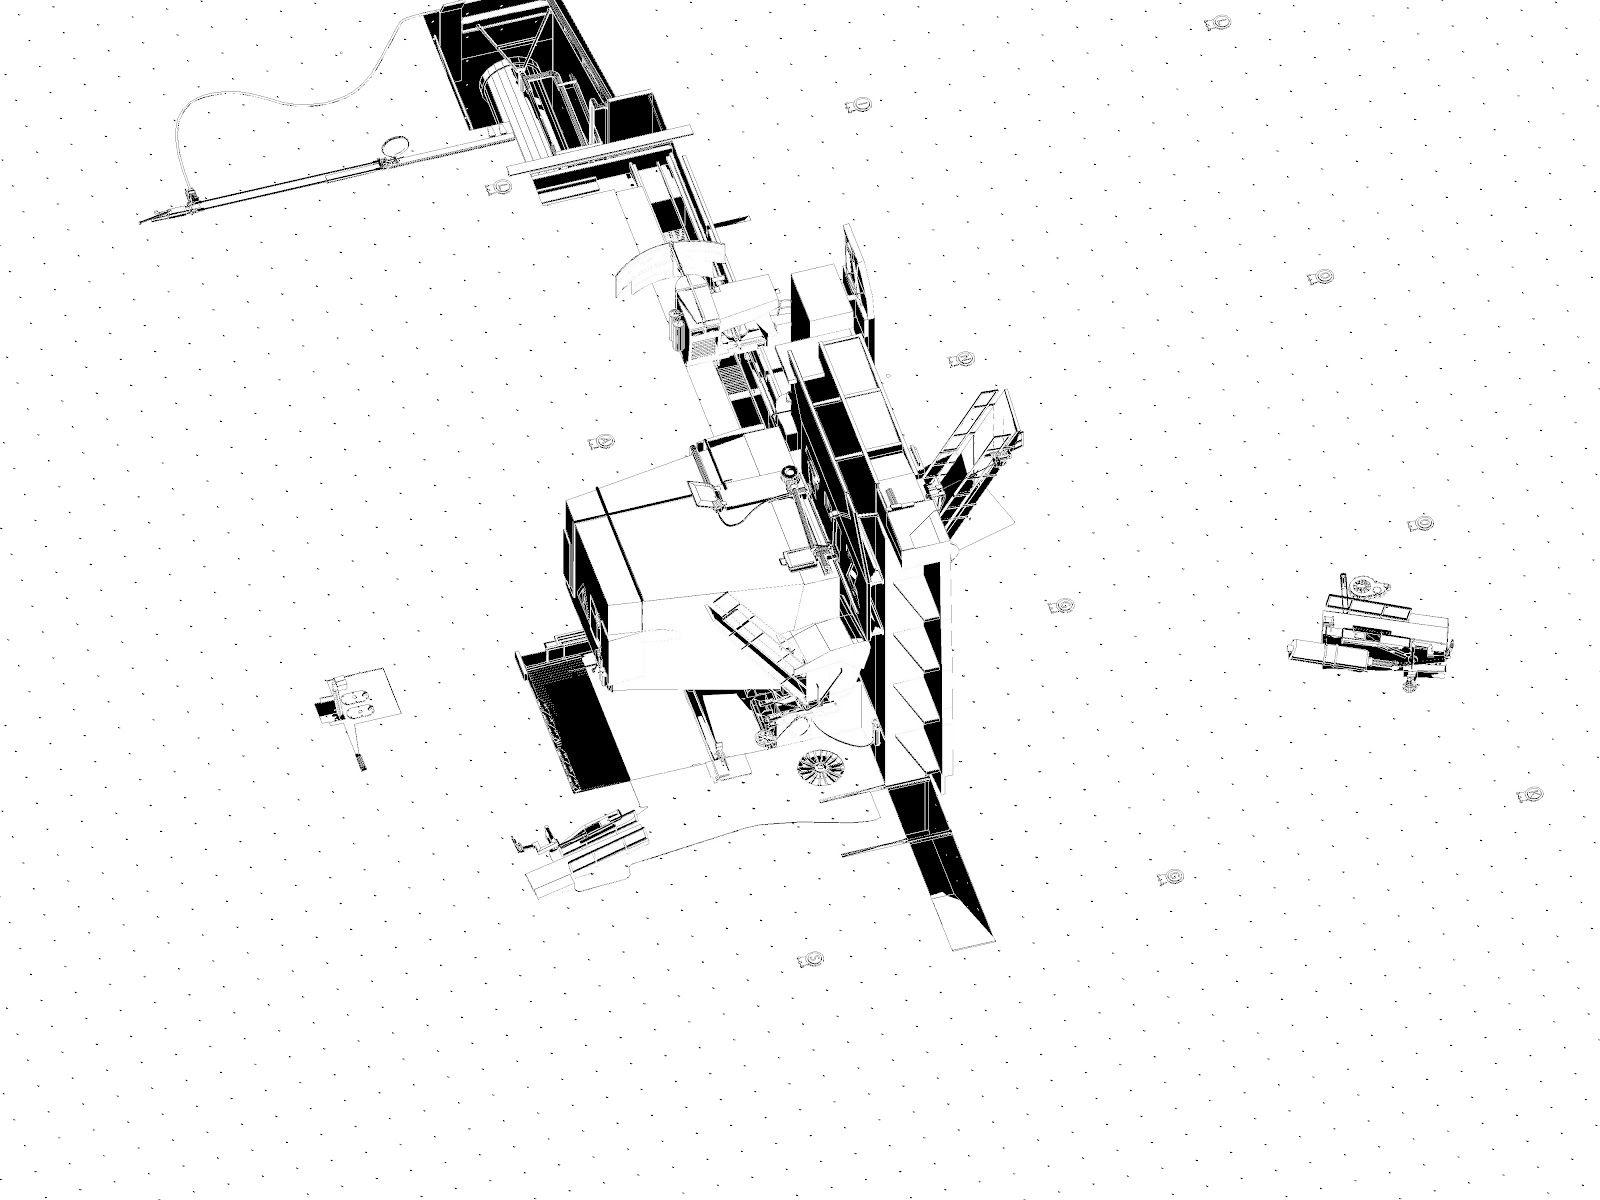 Form Ula Dimension Laboratory